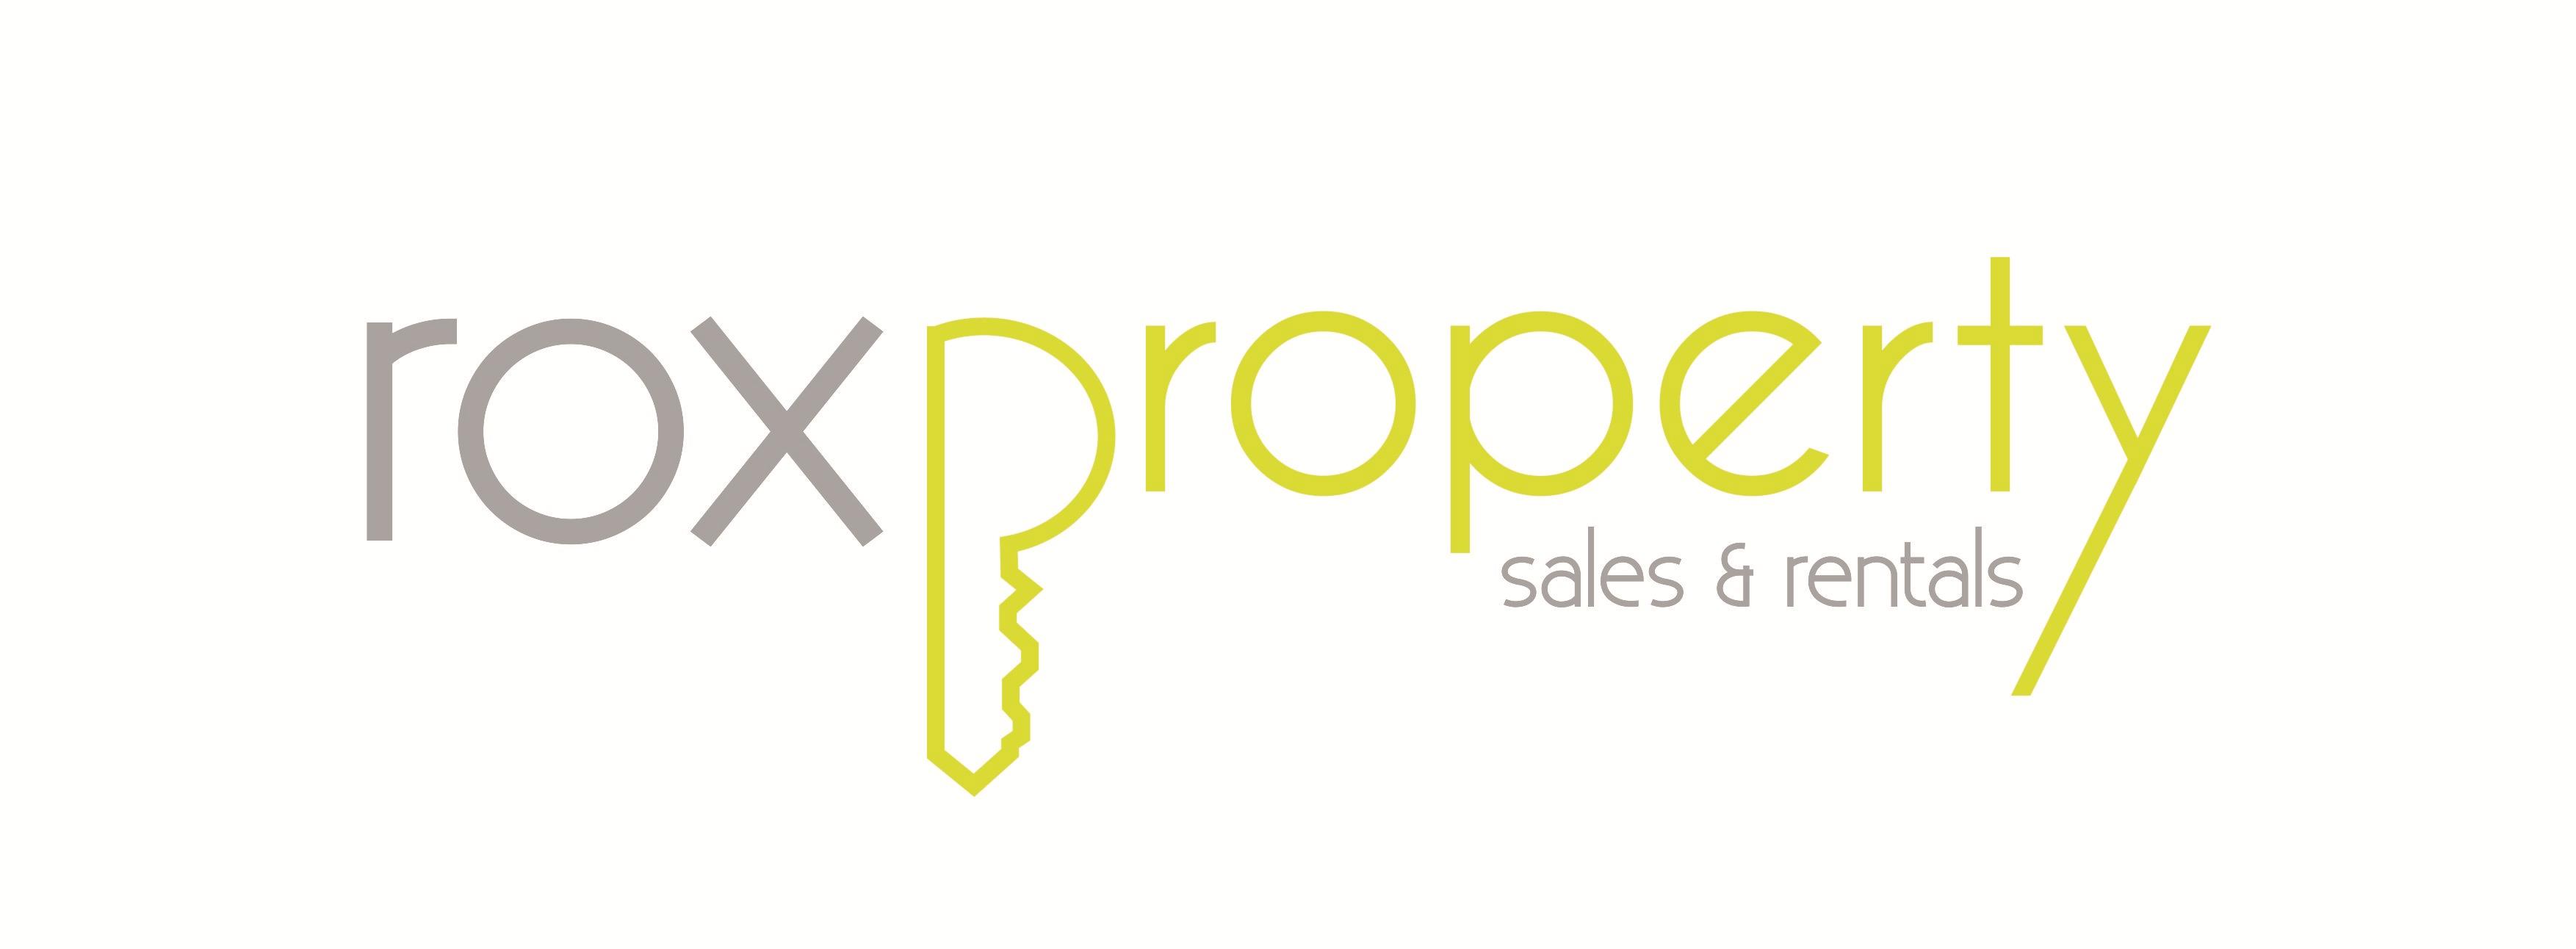 Rox Property, Norwood, 5067